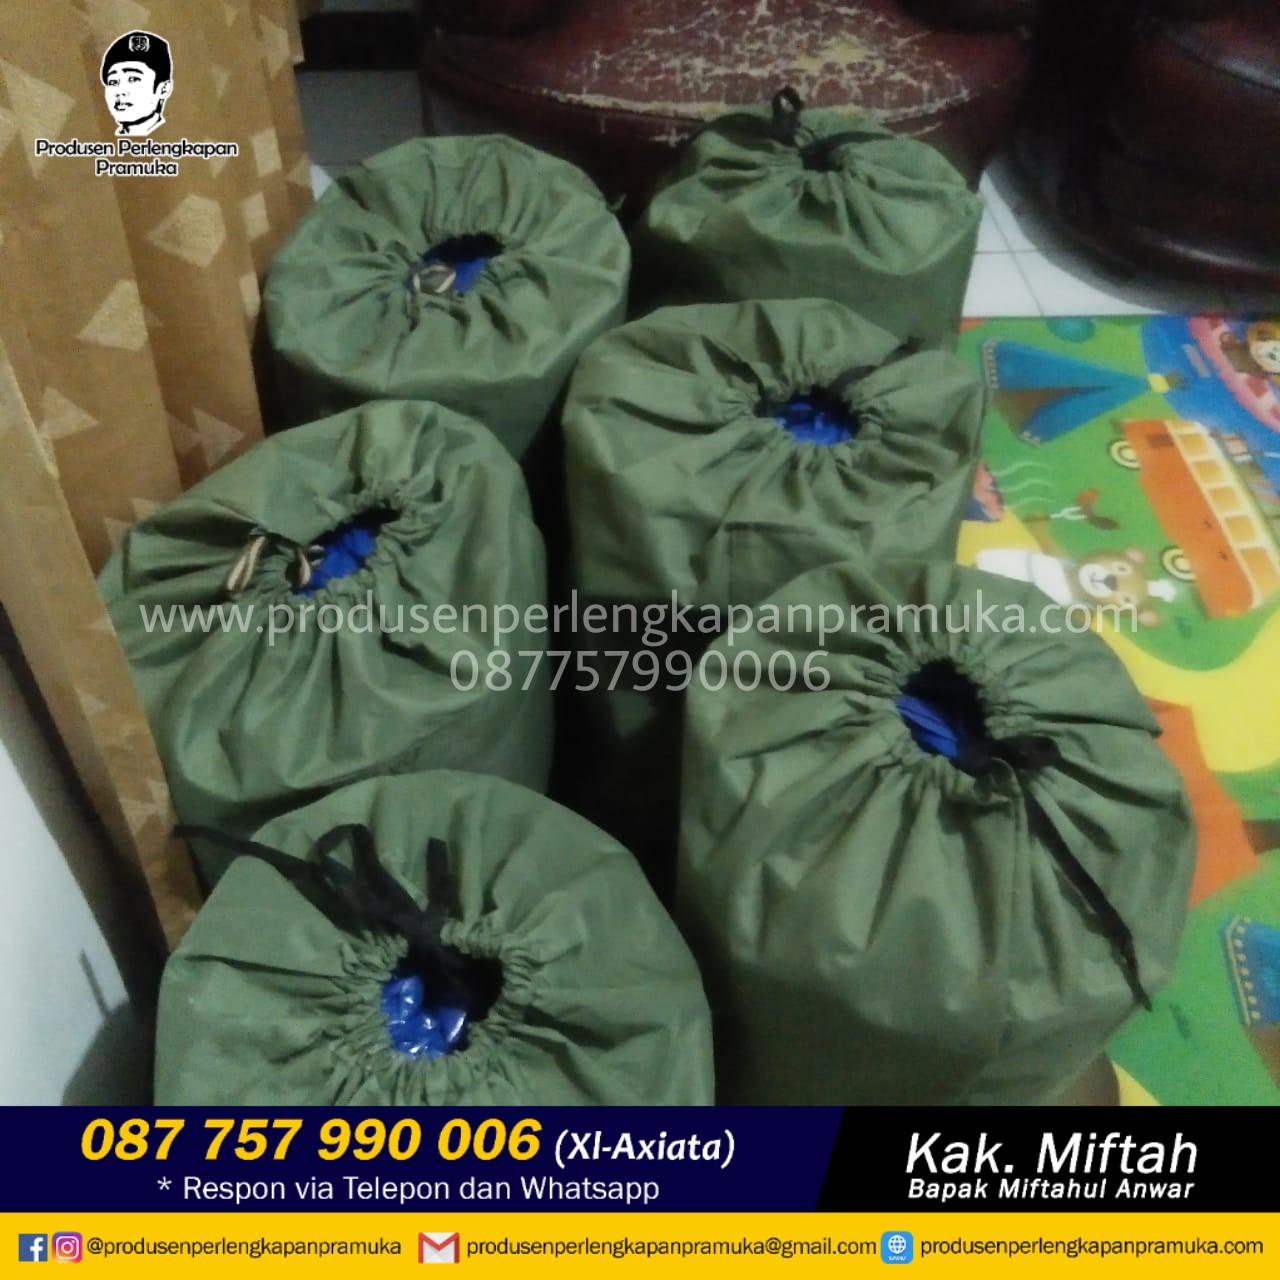 Produsen Tenda Bandung